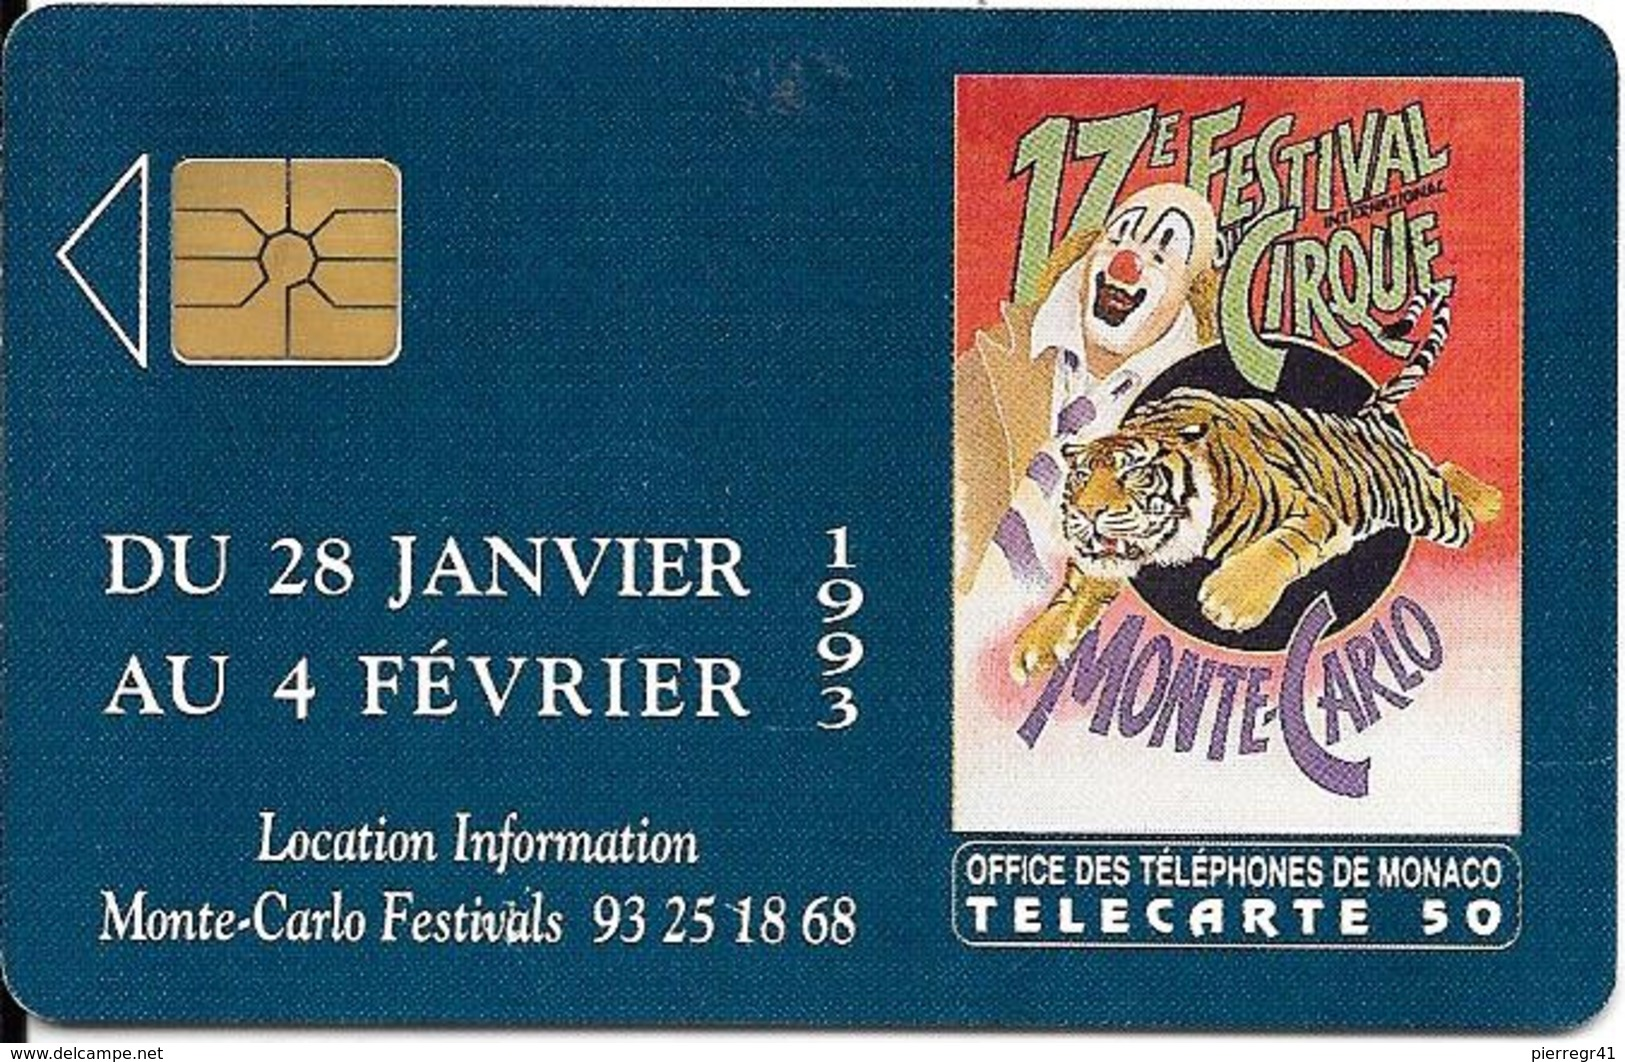 CARTE-PUBLIC-MONACO-50U-MF25-GEMA-S/2eLogo-12/92-17e FESTIVAL Du CIRQUE-UTILISE-V°N°B2B0P0011 / -TBE - Monaco